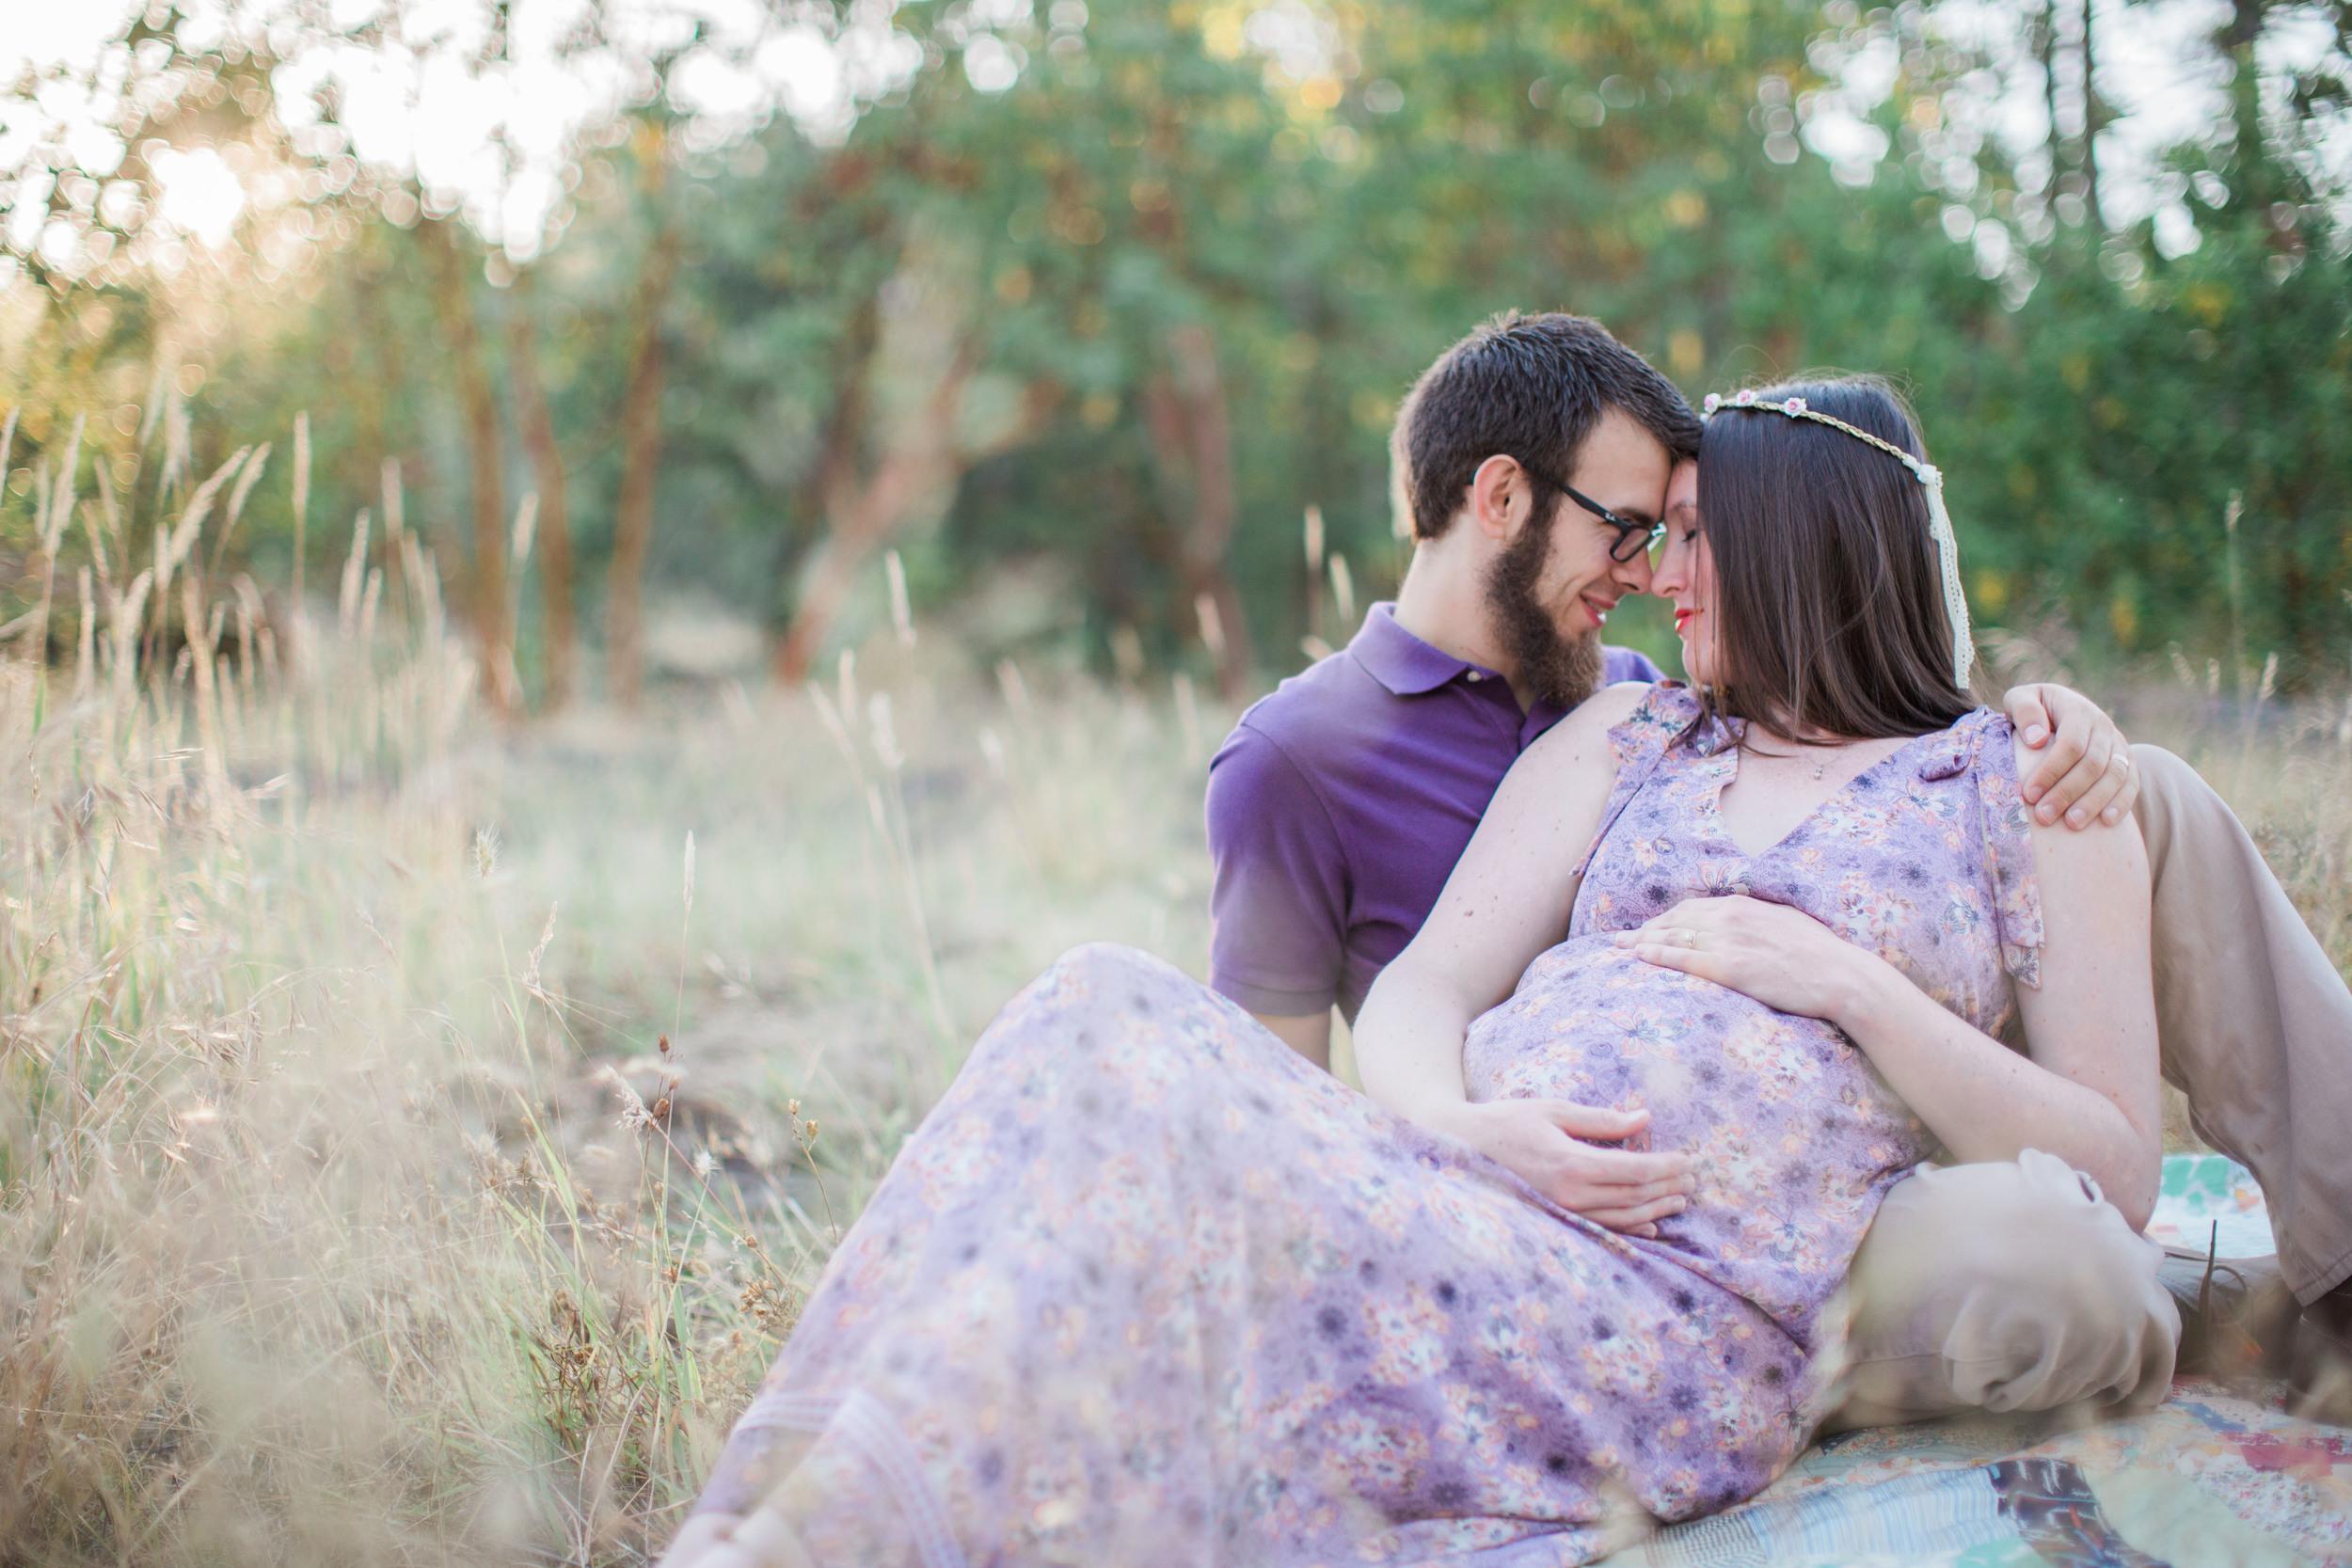 BrookeShane_maternity-3.jpg